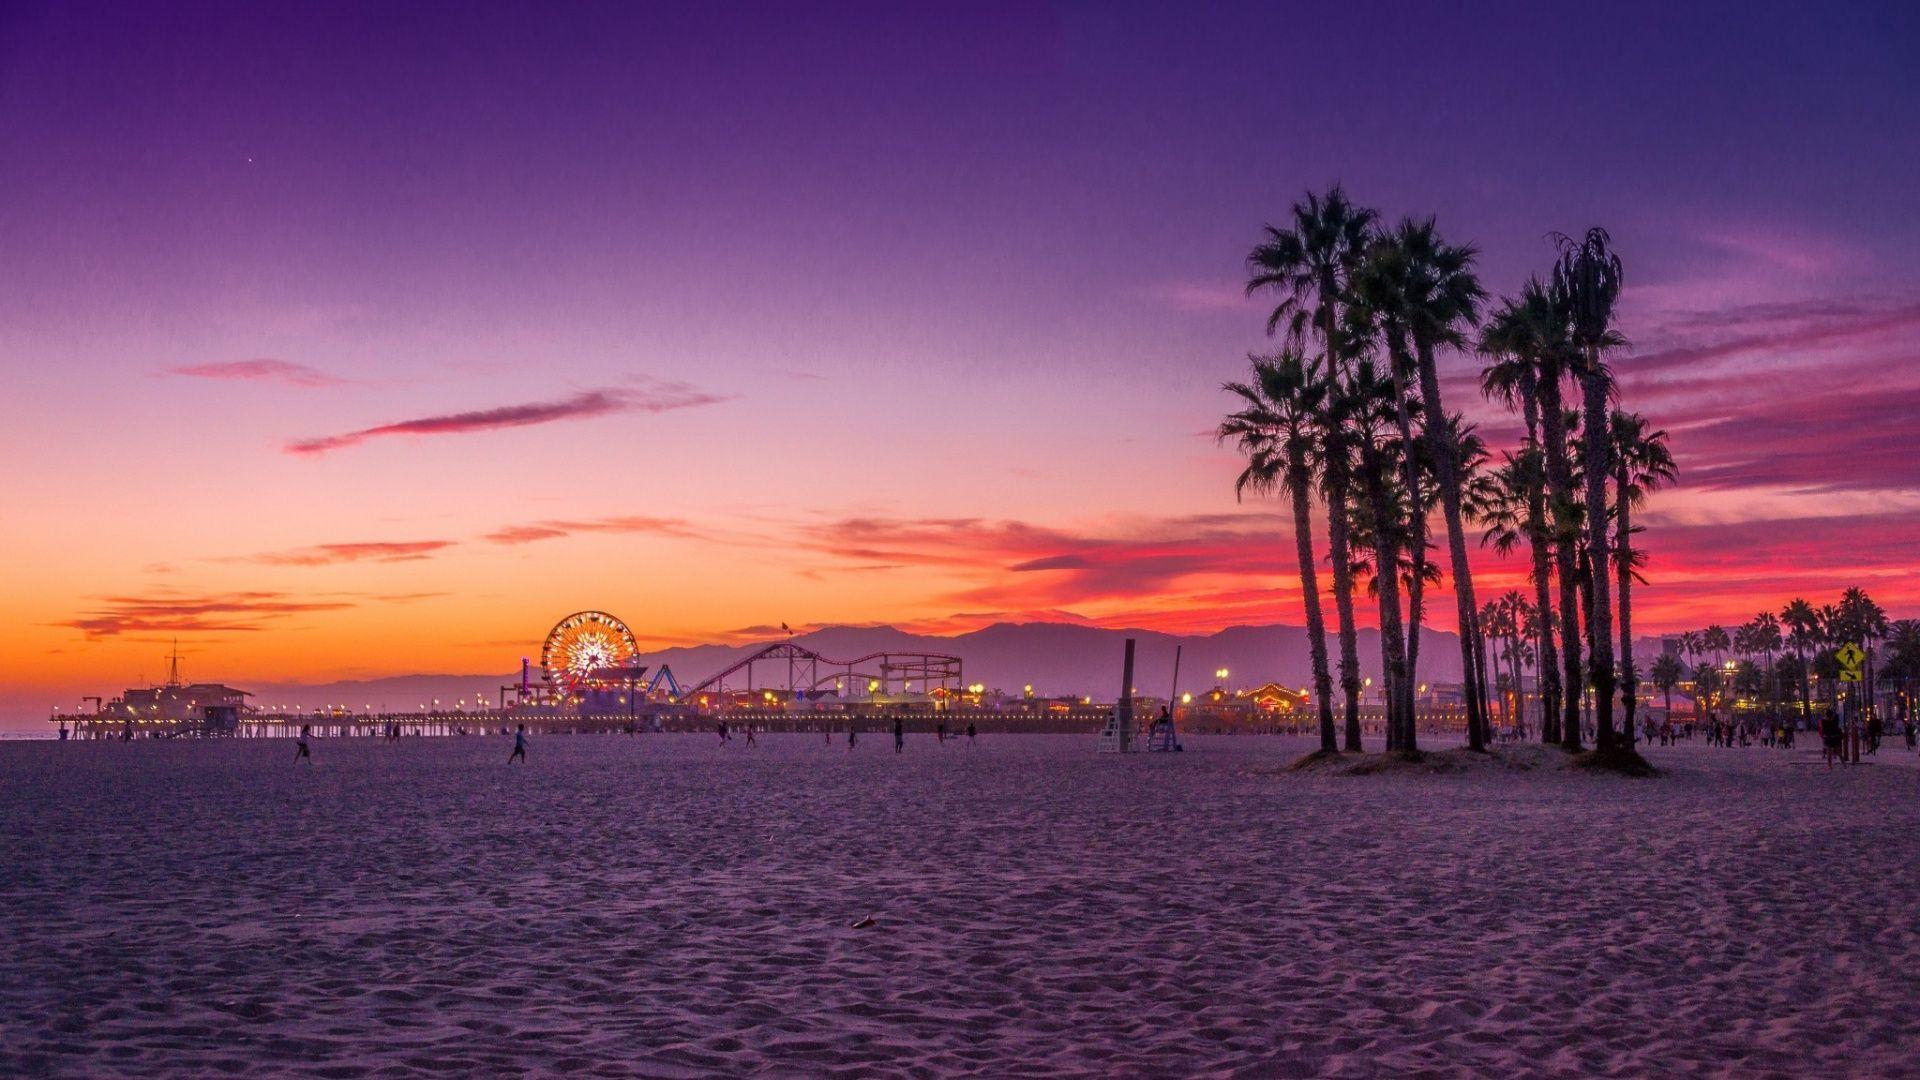 California Wallpapers Top Free California Backgrounds